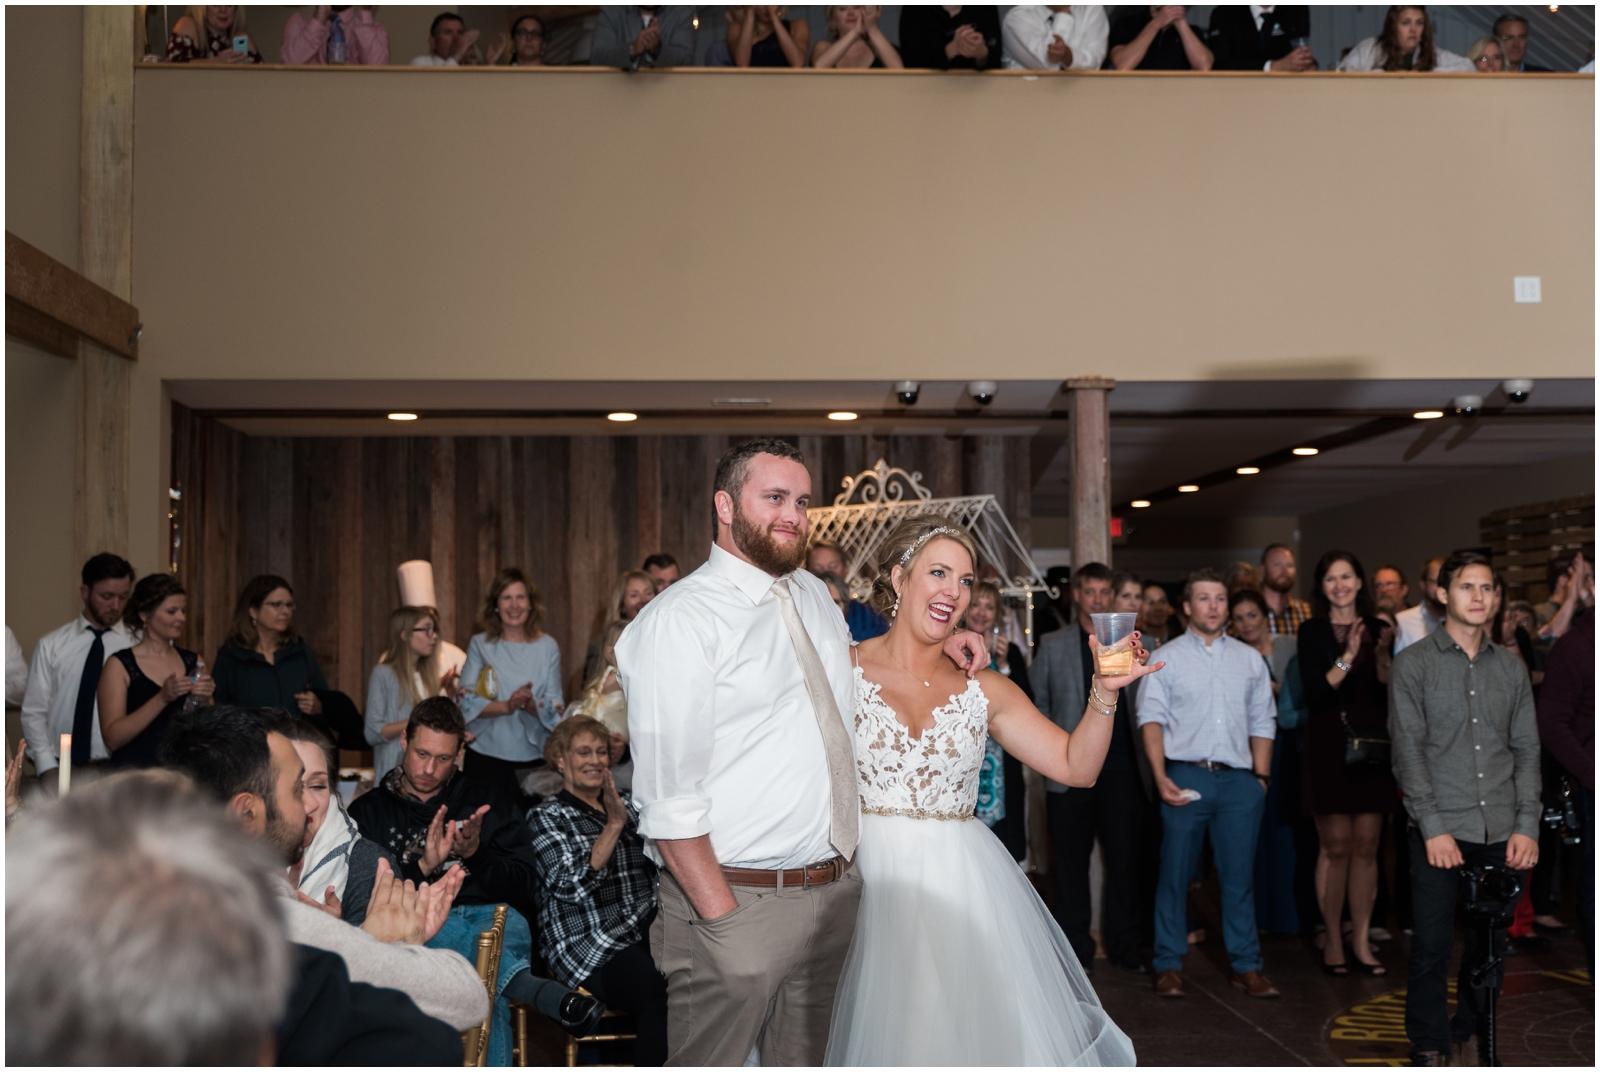 Minnesota-Wedding-Venue- Chaska-MN-Rustic-Barn-Weddings_0606.jpg